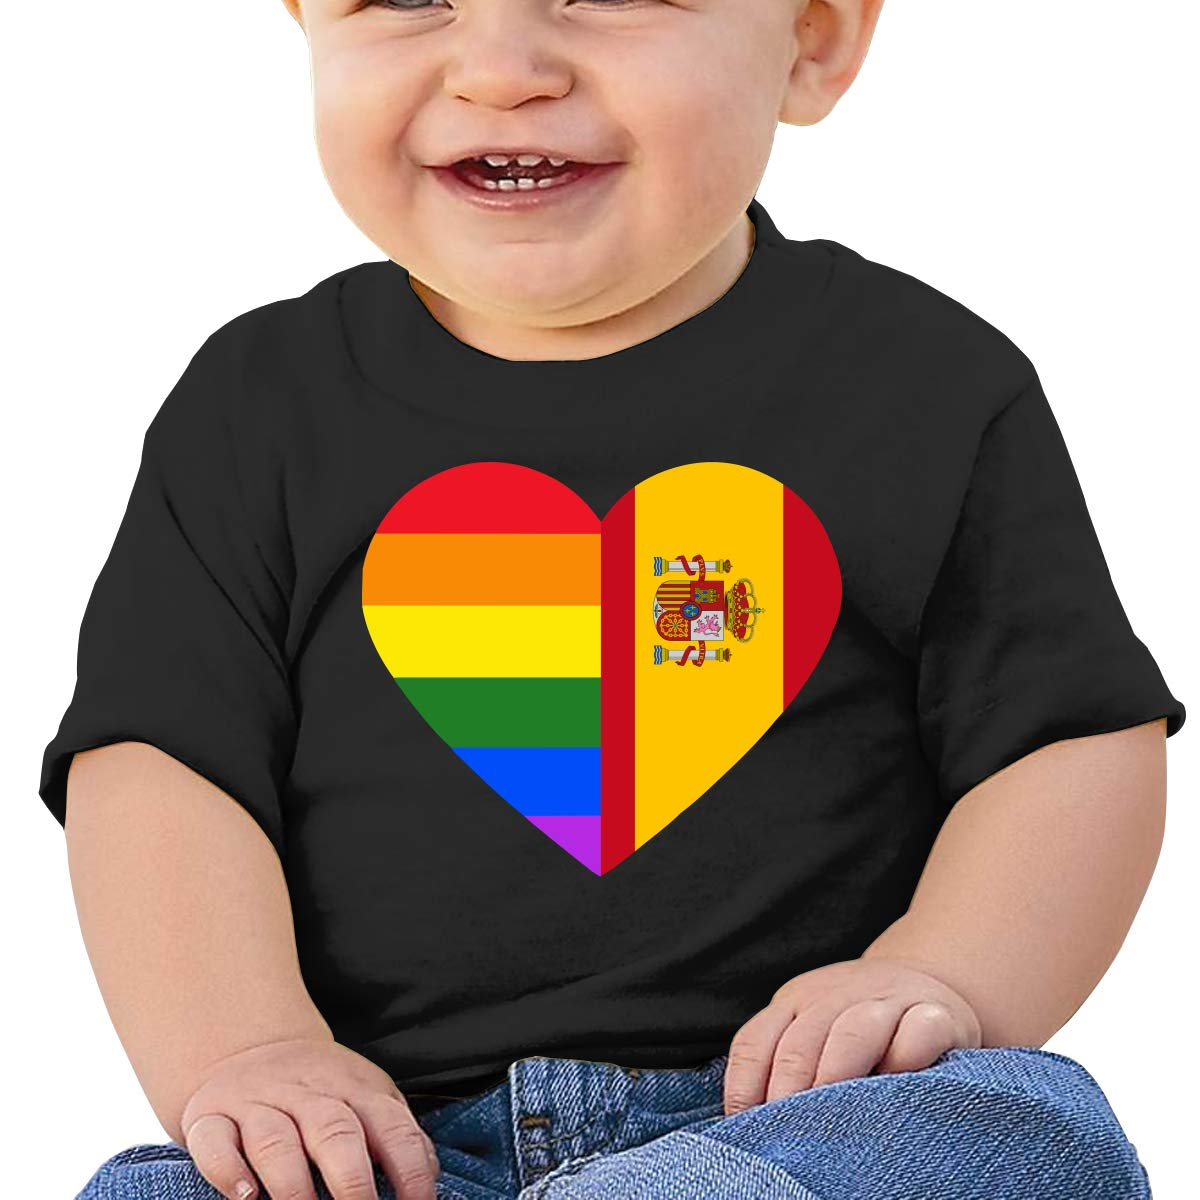 LGBT Rainbow Spain Flag Heart Newborn Baby Newborn Short Sleeve T-Shirt 6-24 Month Soft Tops